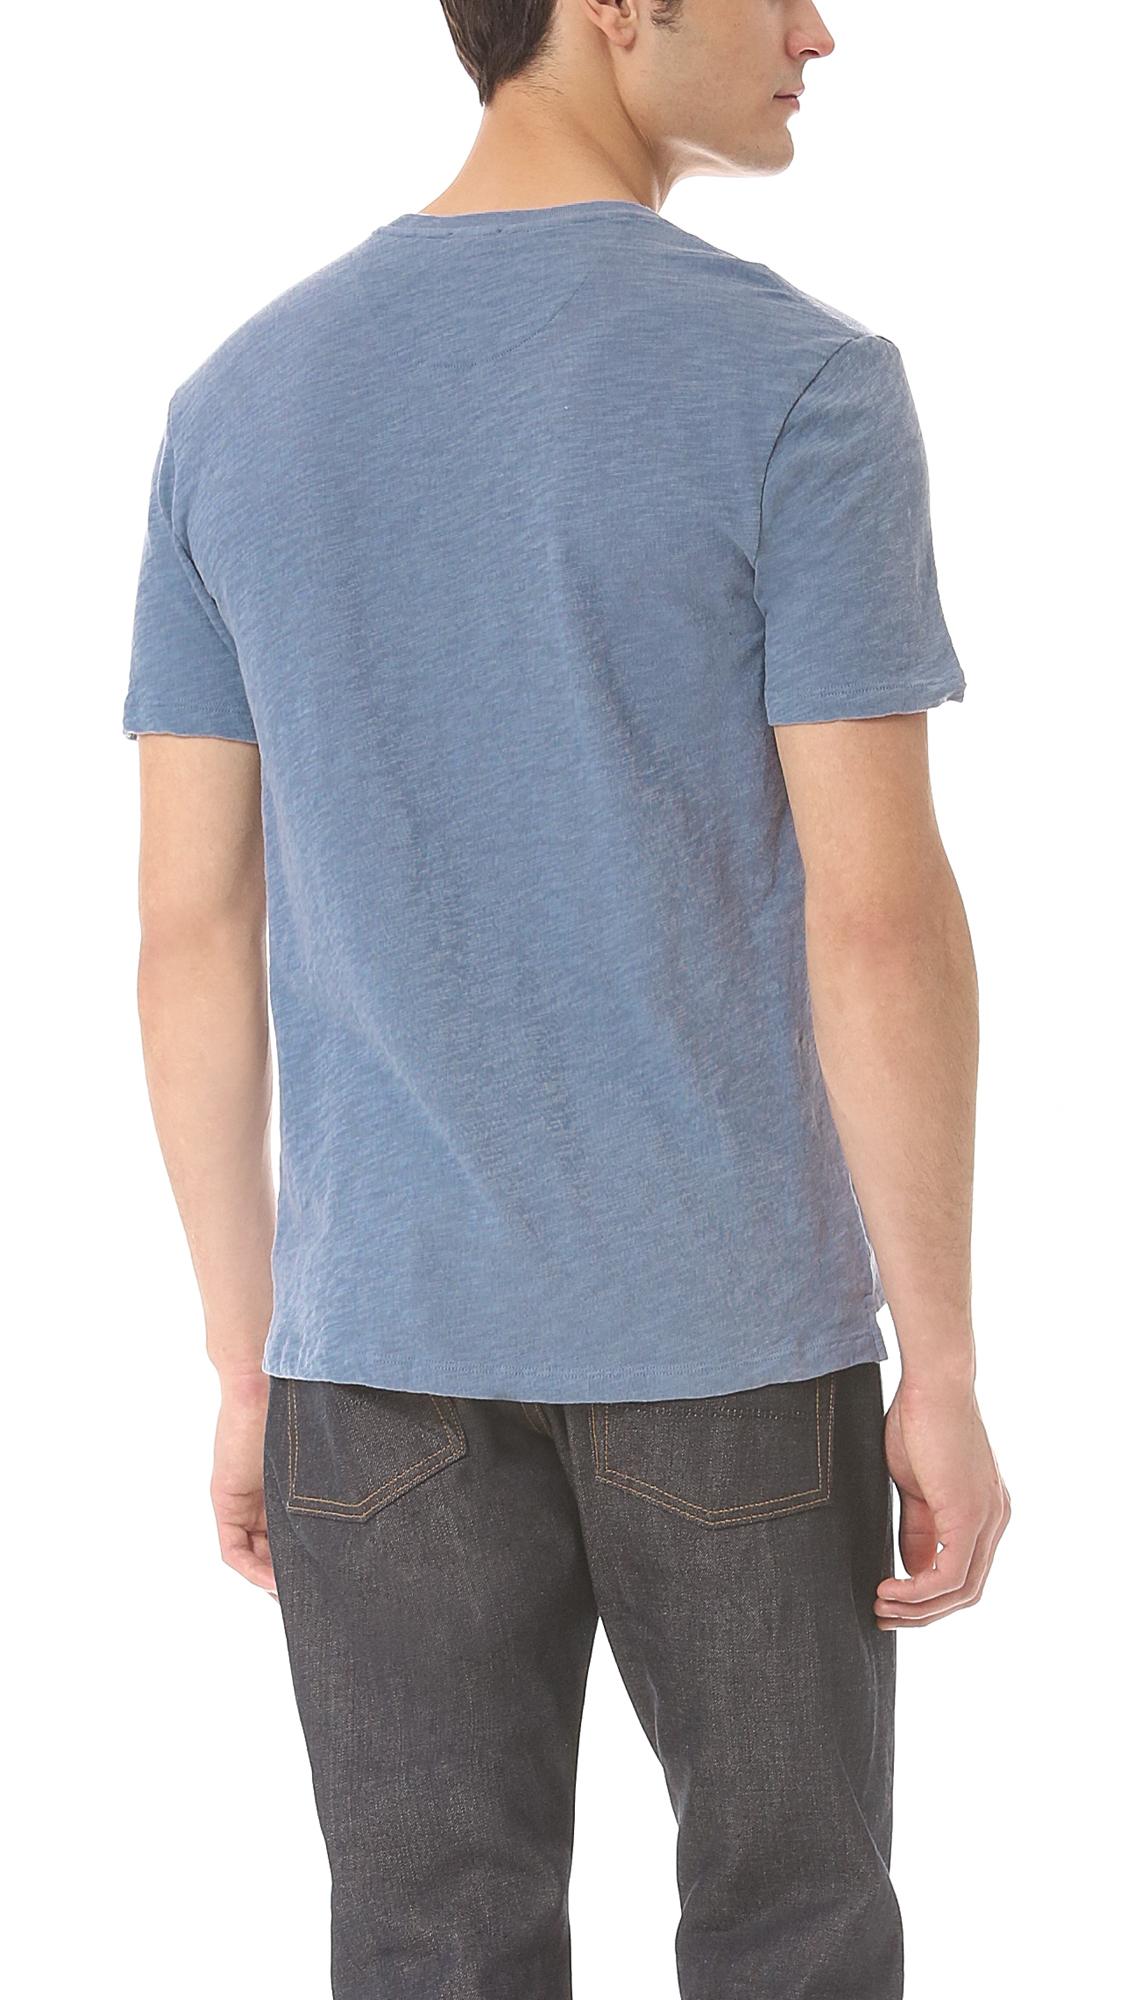 Vince slub t shirt in blue for men herring lyst for What is a slub shirt